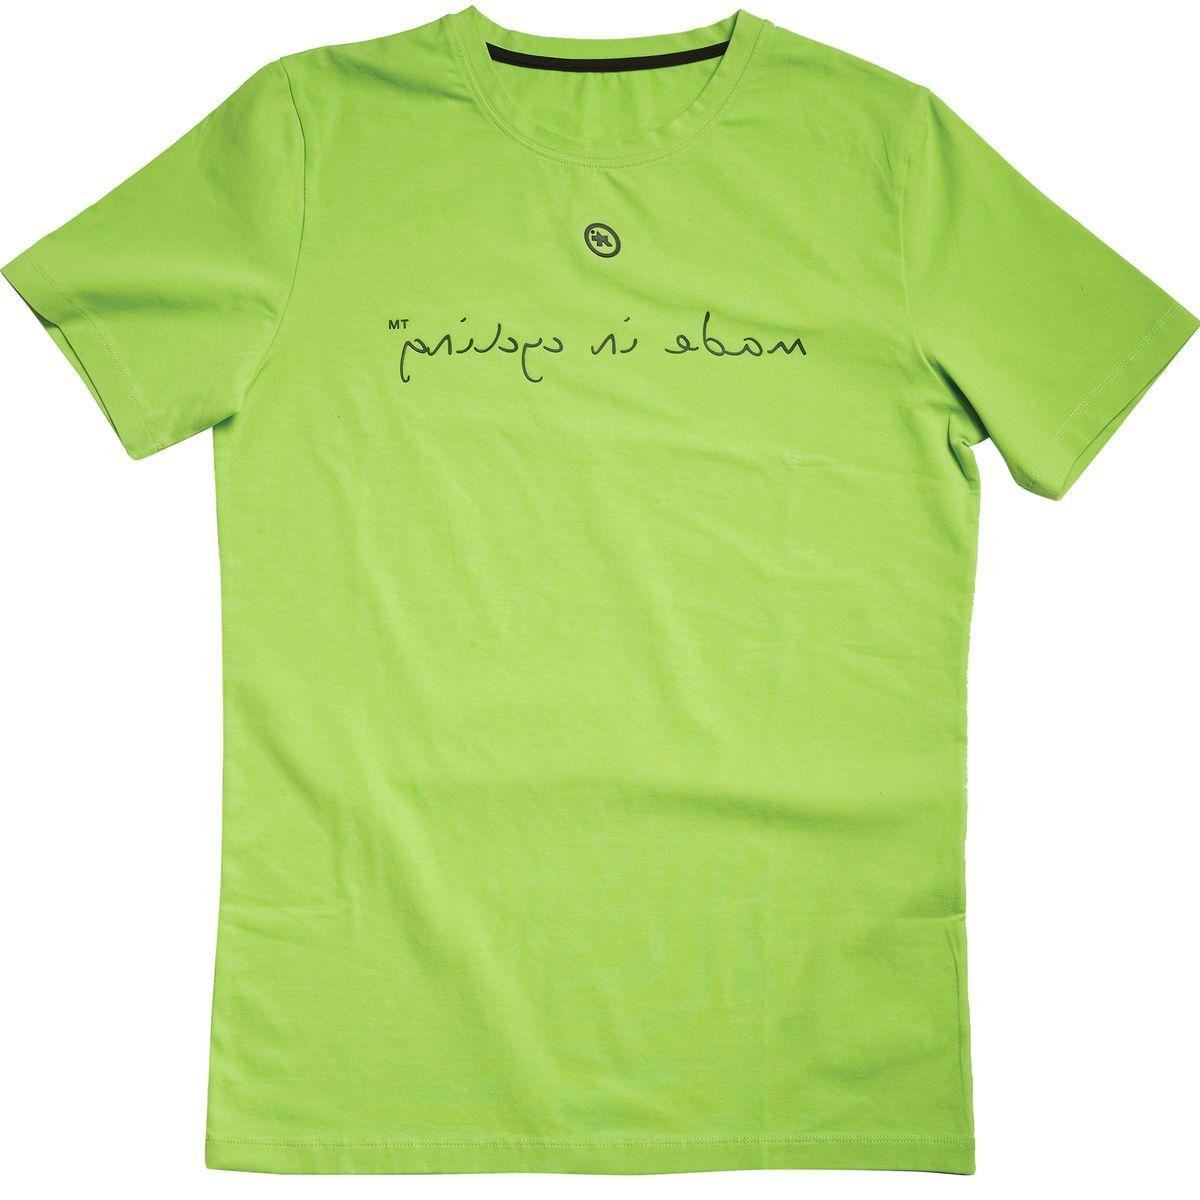 Assos Made In Cycling Short-Sleeve T-Shirt - Men's